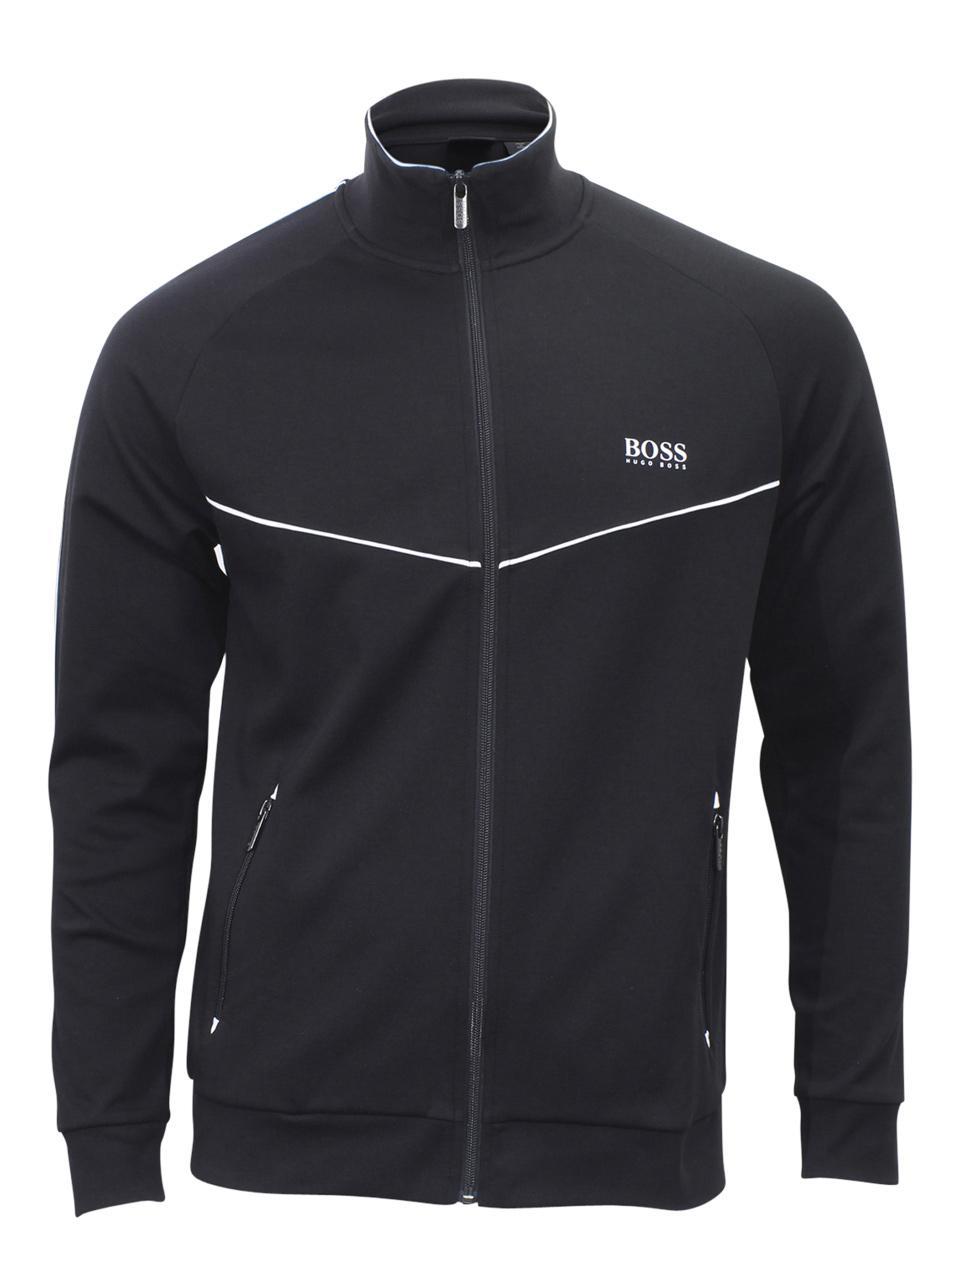 Hugo Boss Men's Pique Loungewear Tracksuit Jacket